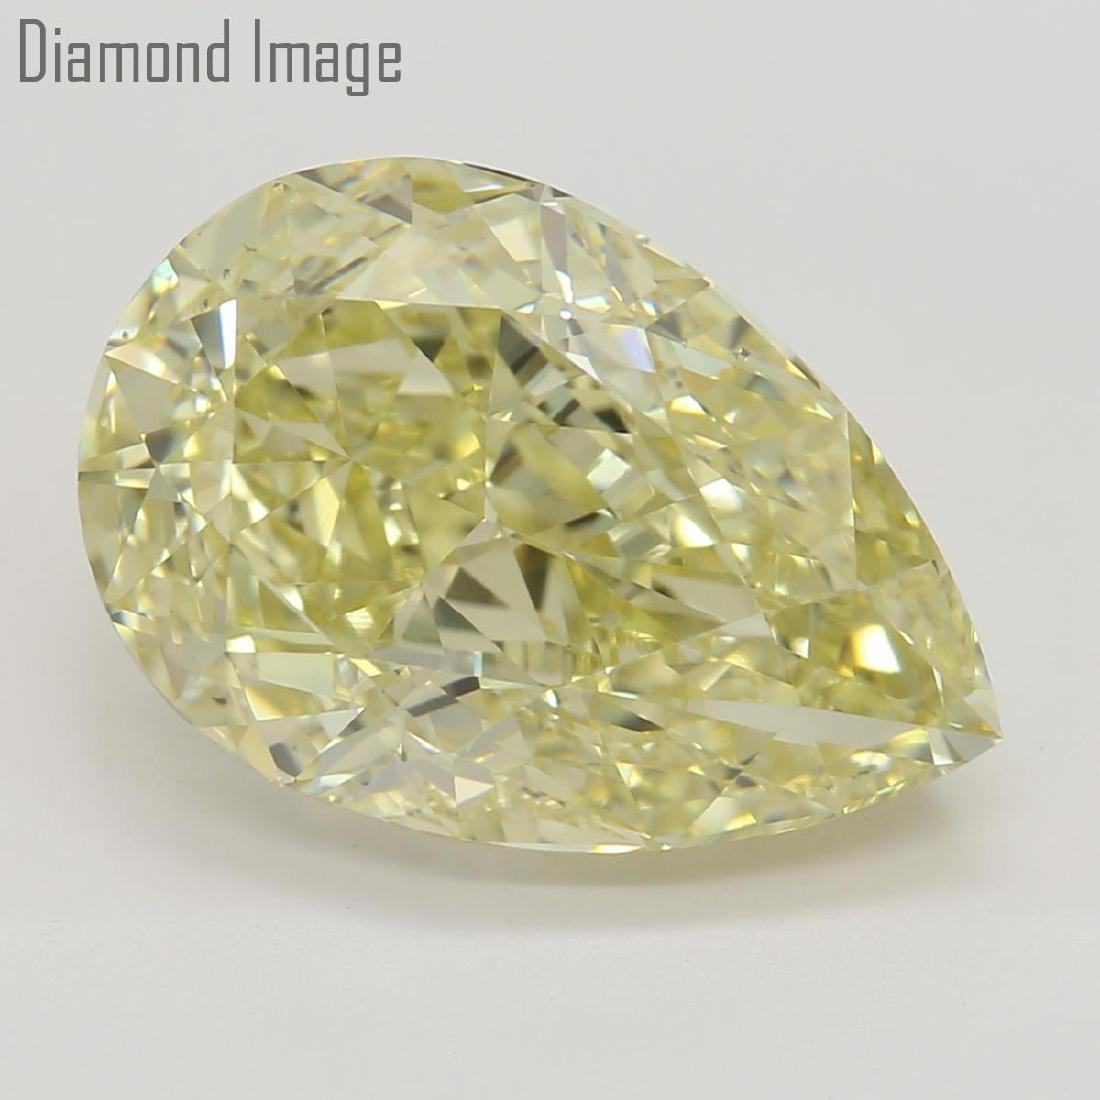 4.23 ct, Natural Color/VS2, Pear cut Diamond